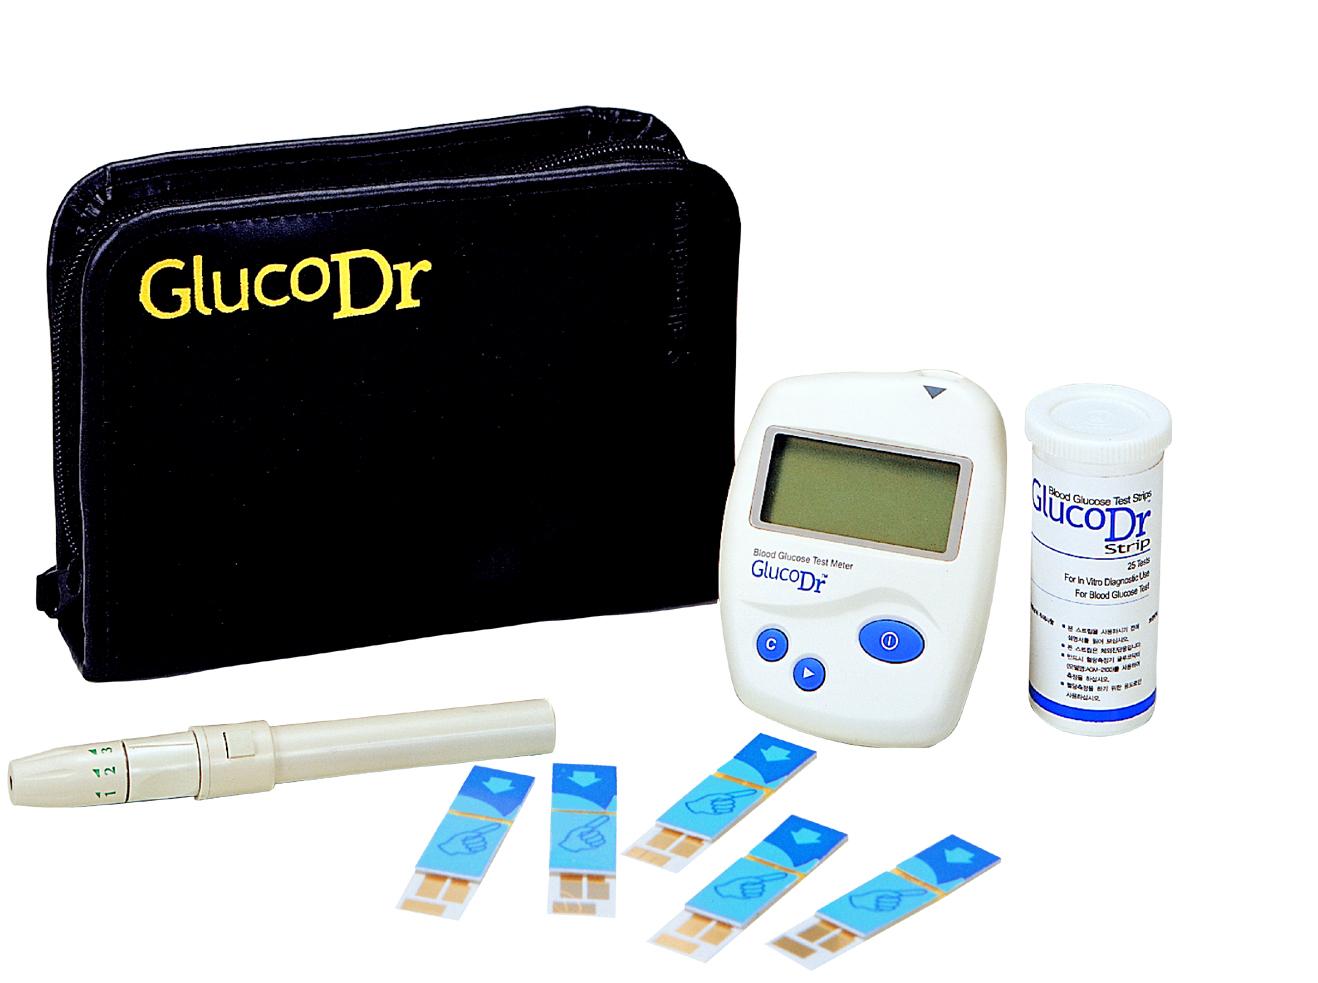 Glucodr Alat Fitness Jakarta Strip Gluco Dr Bio Sensor Agm2100